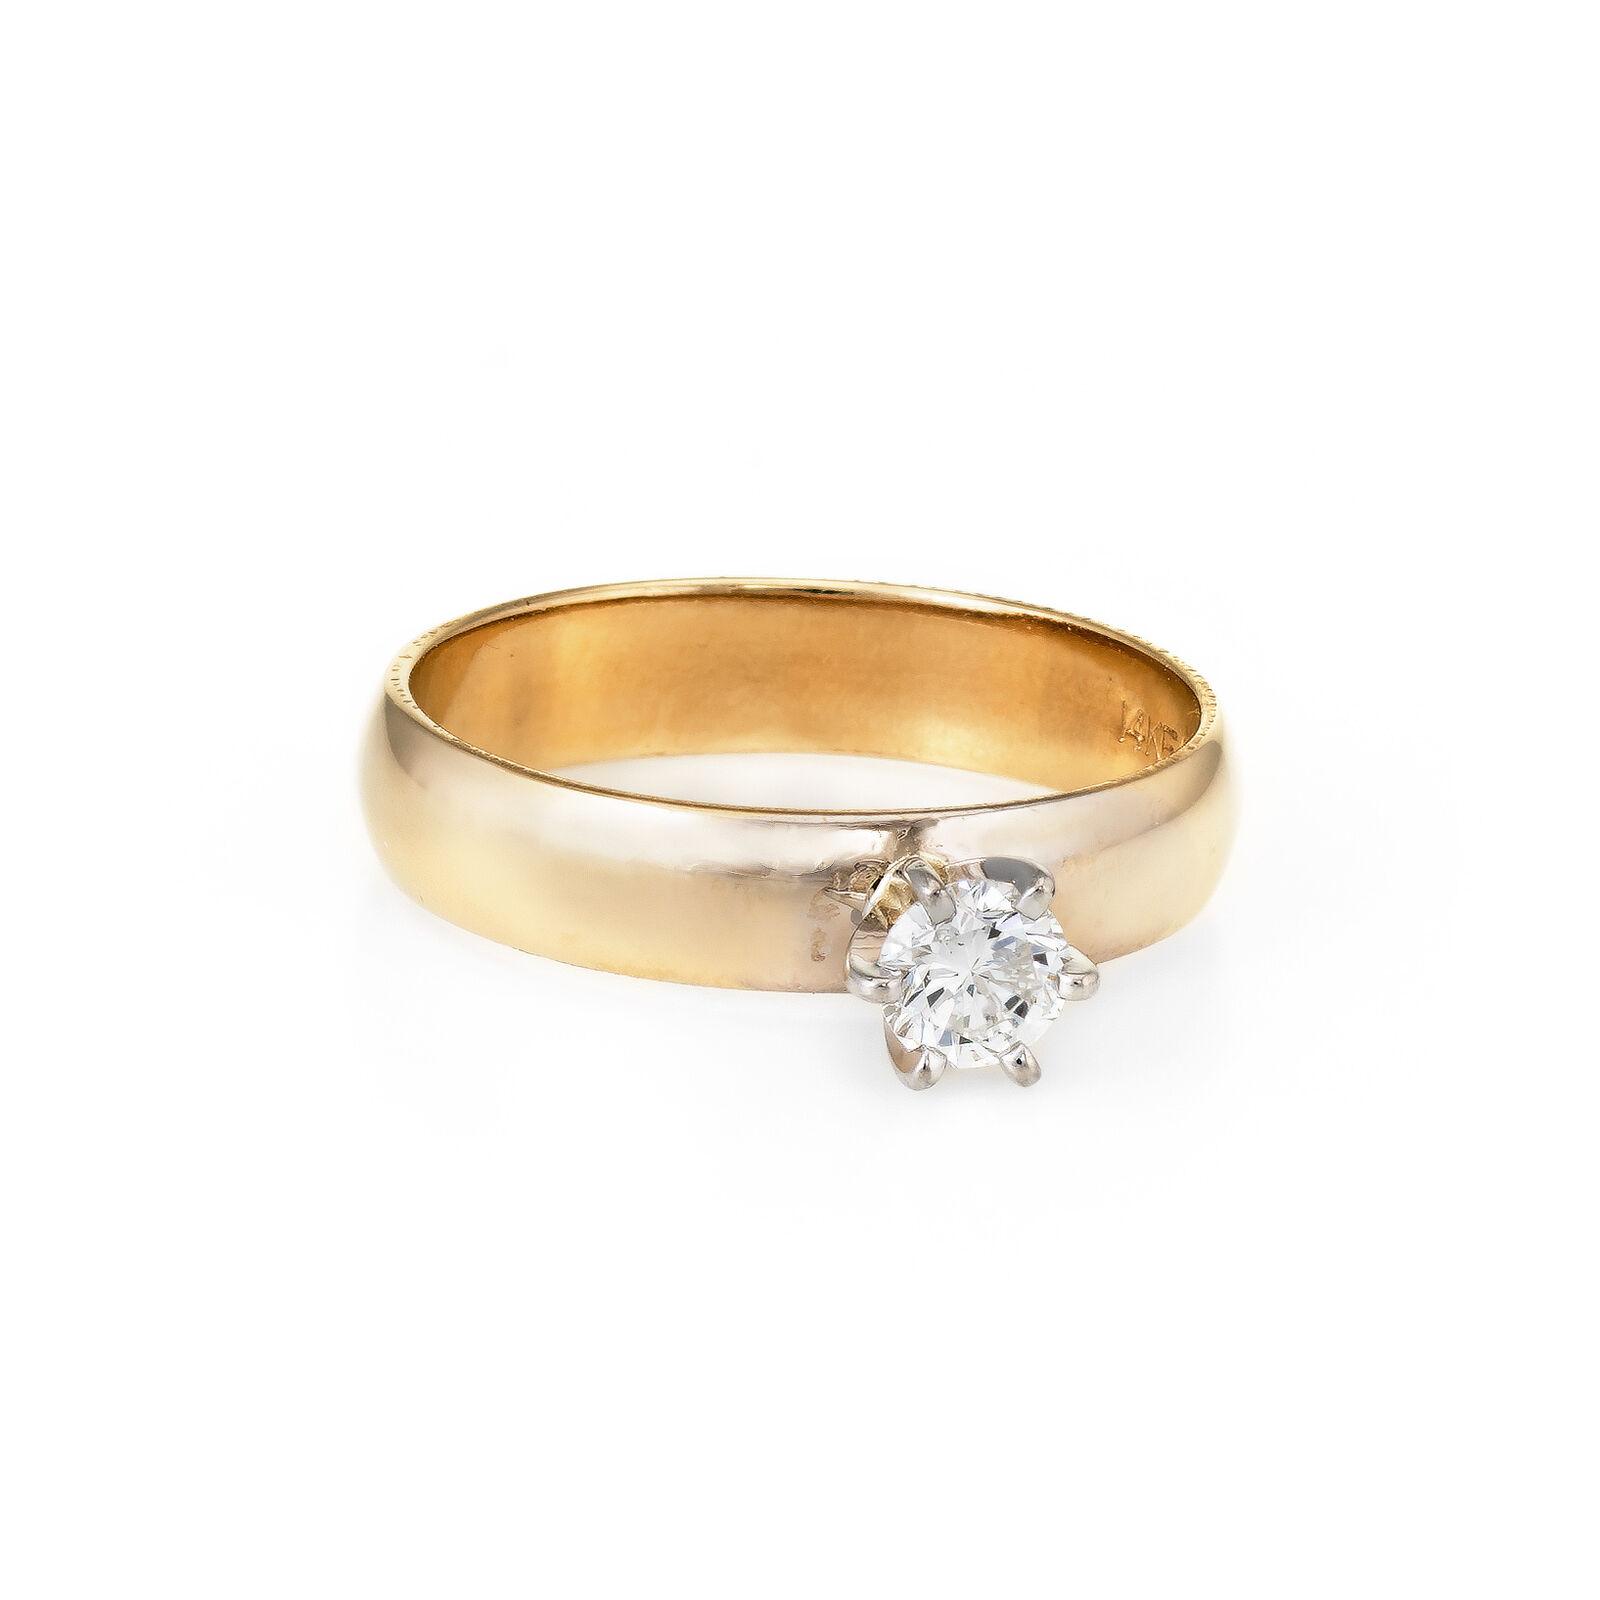 Diamond Engagement Ring Vintage 14k Yellow gold Estate Fine Jewelry Sz 5.5